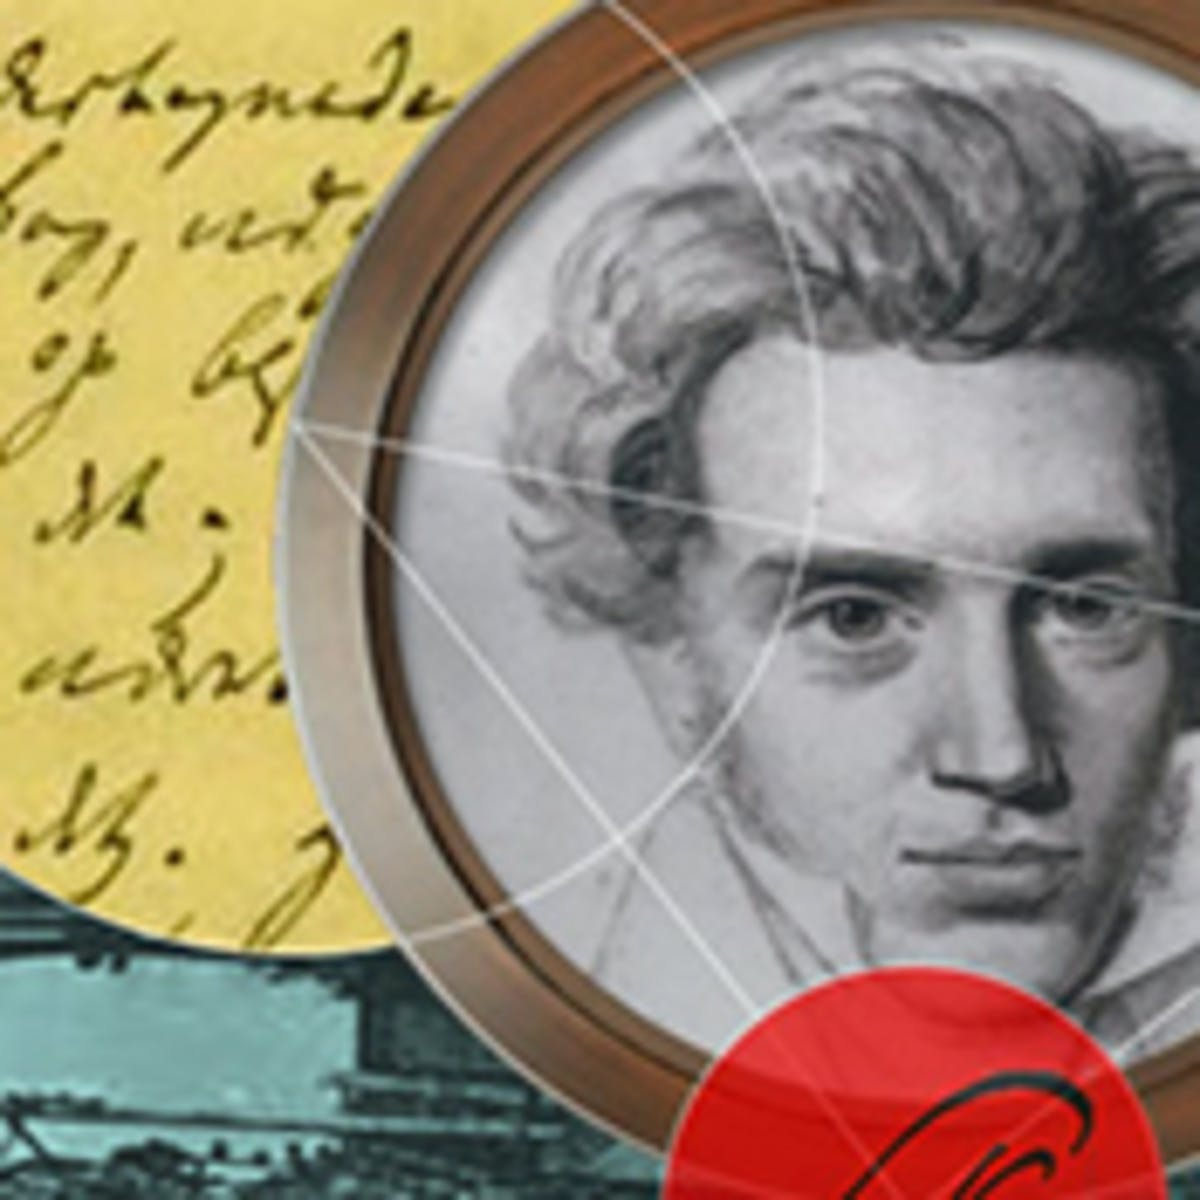 Søren Kierkegaard - Subjectivity, Irony and the Crisis of Modernity